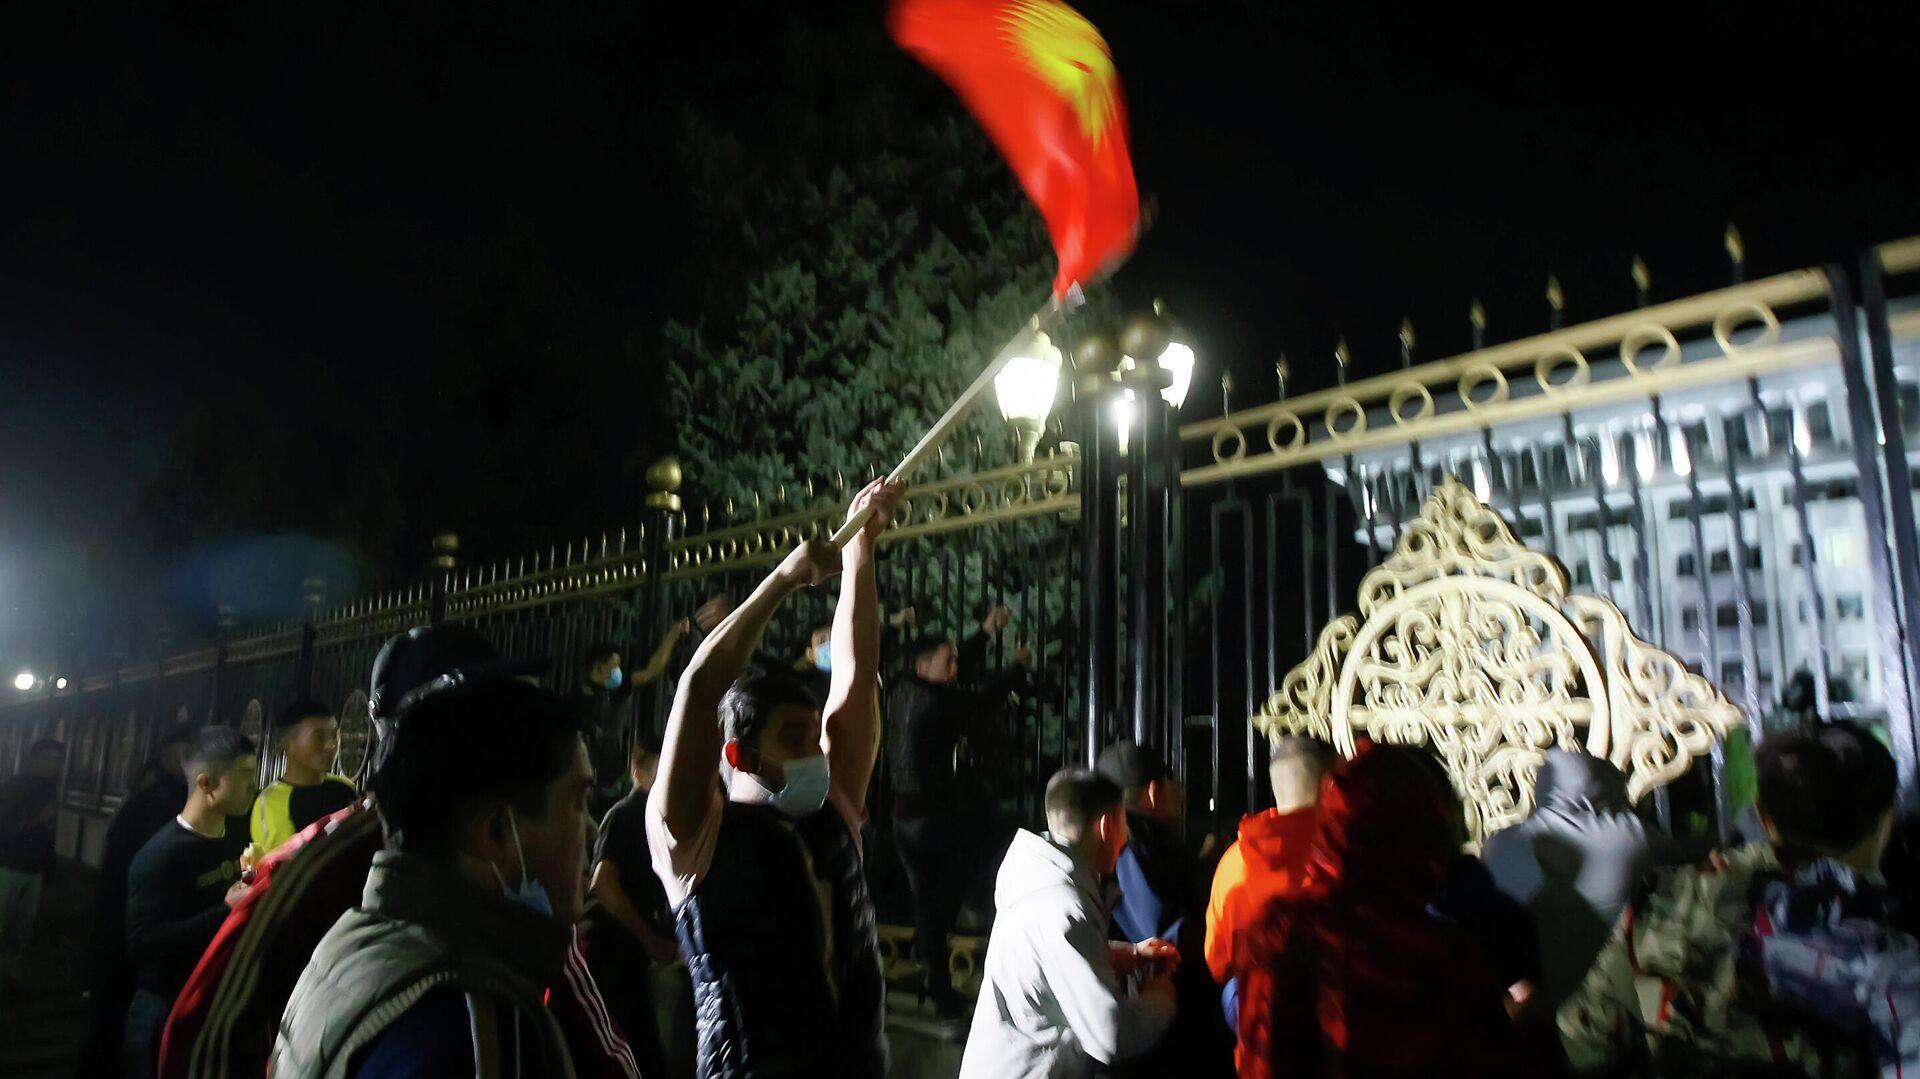 Протестующие в Бишкеке - РИА Новости, 1920, 06.10.2020